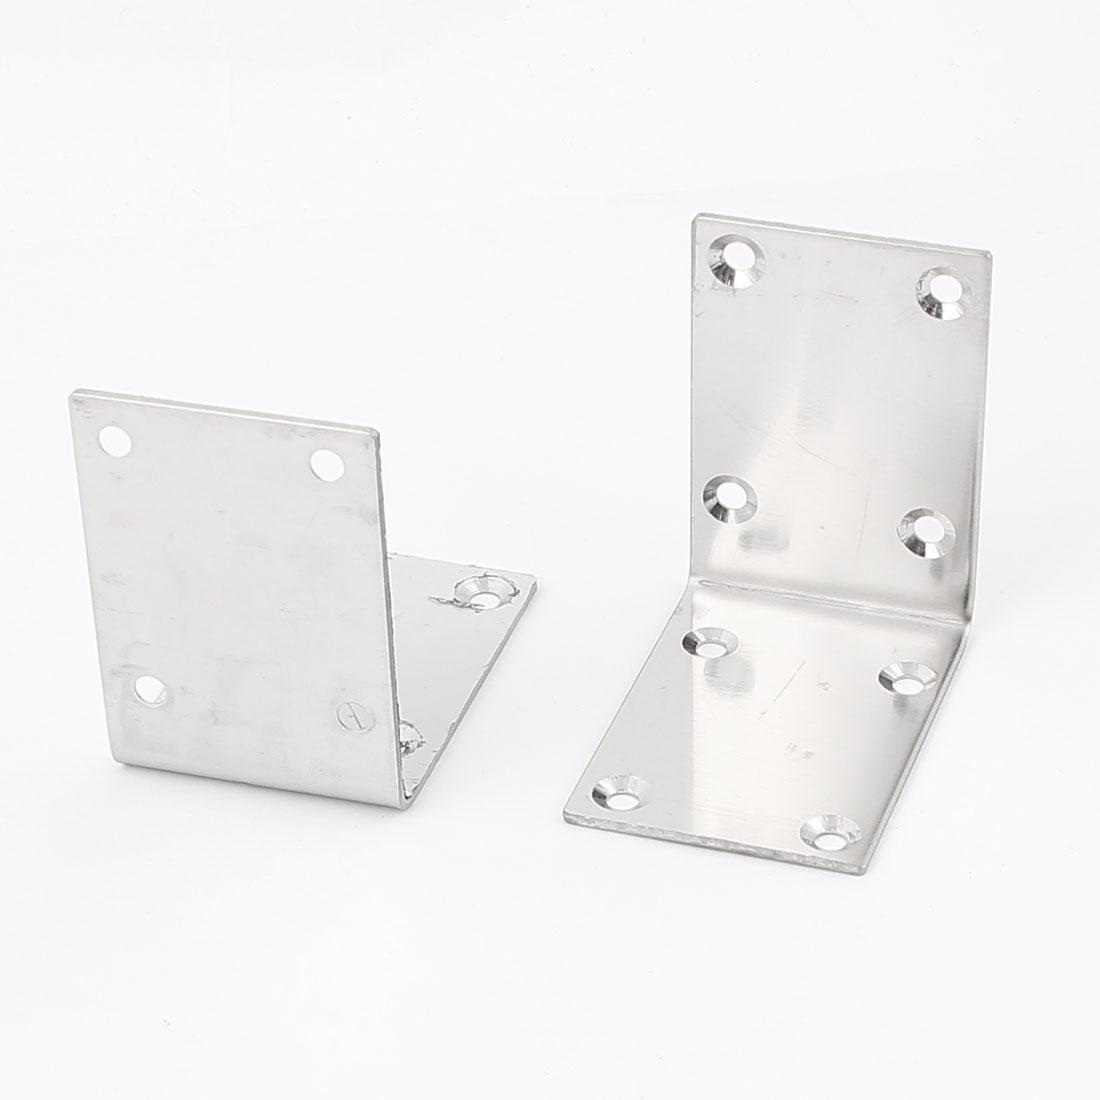 70mmx70mmx49mm Shelf Support Corner Brace Joint Metal Right Angle Bracket 2Pcs